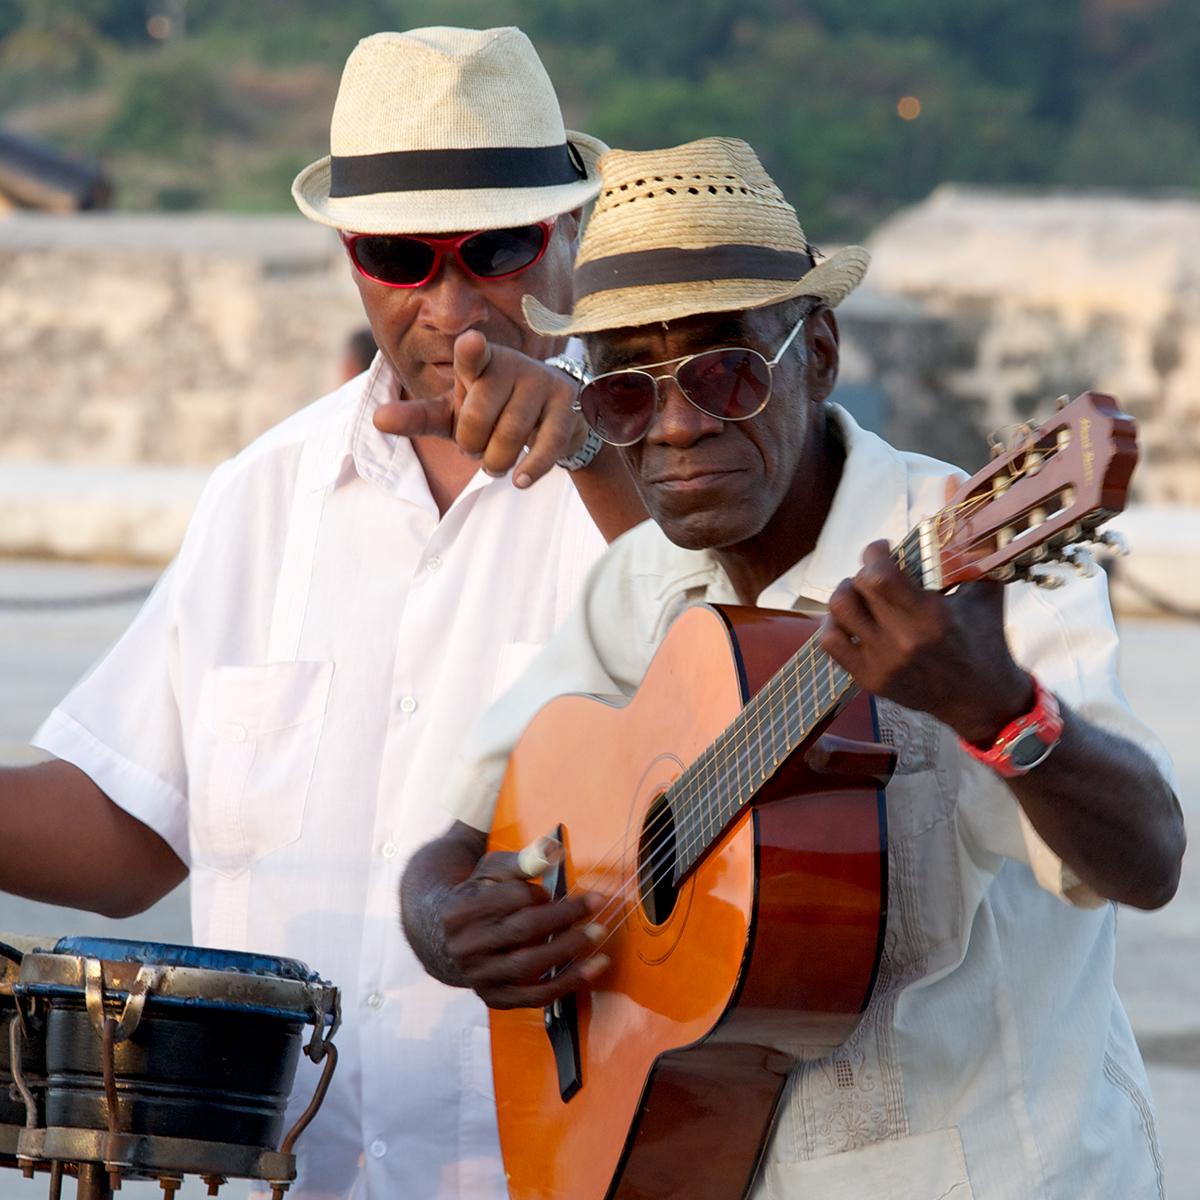 cuba-Music-Cuba-Havana-5-14- C26O3548v.jpg